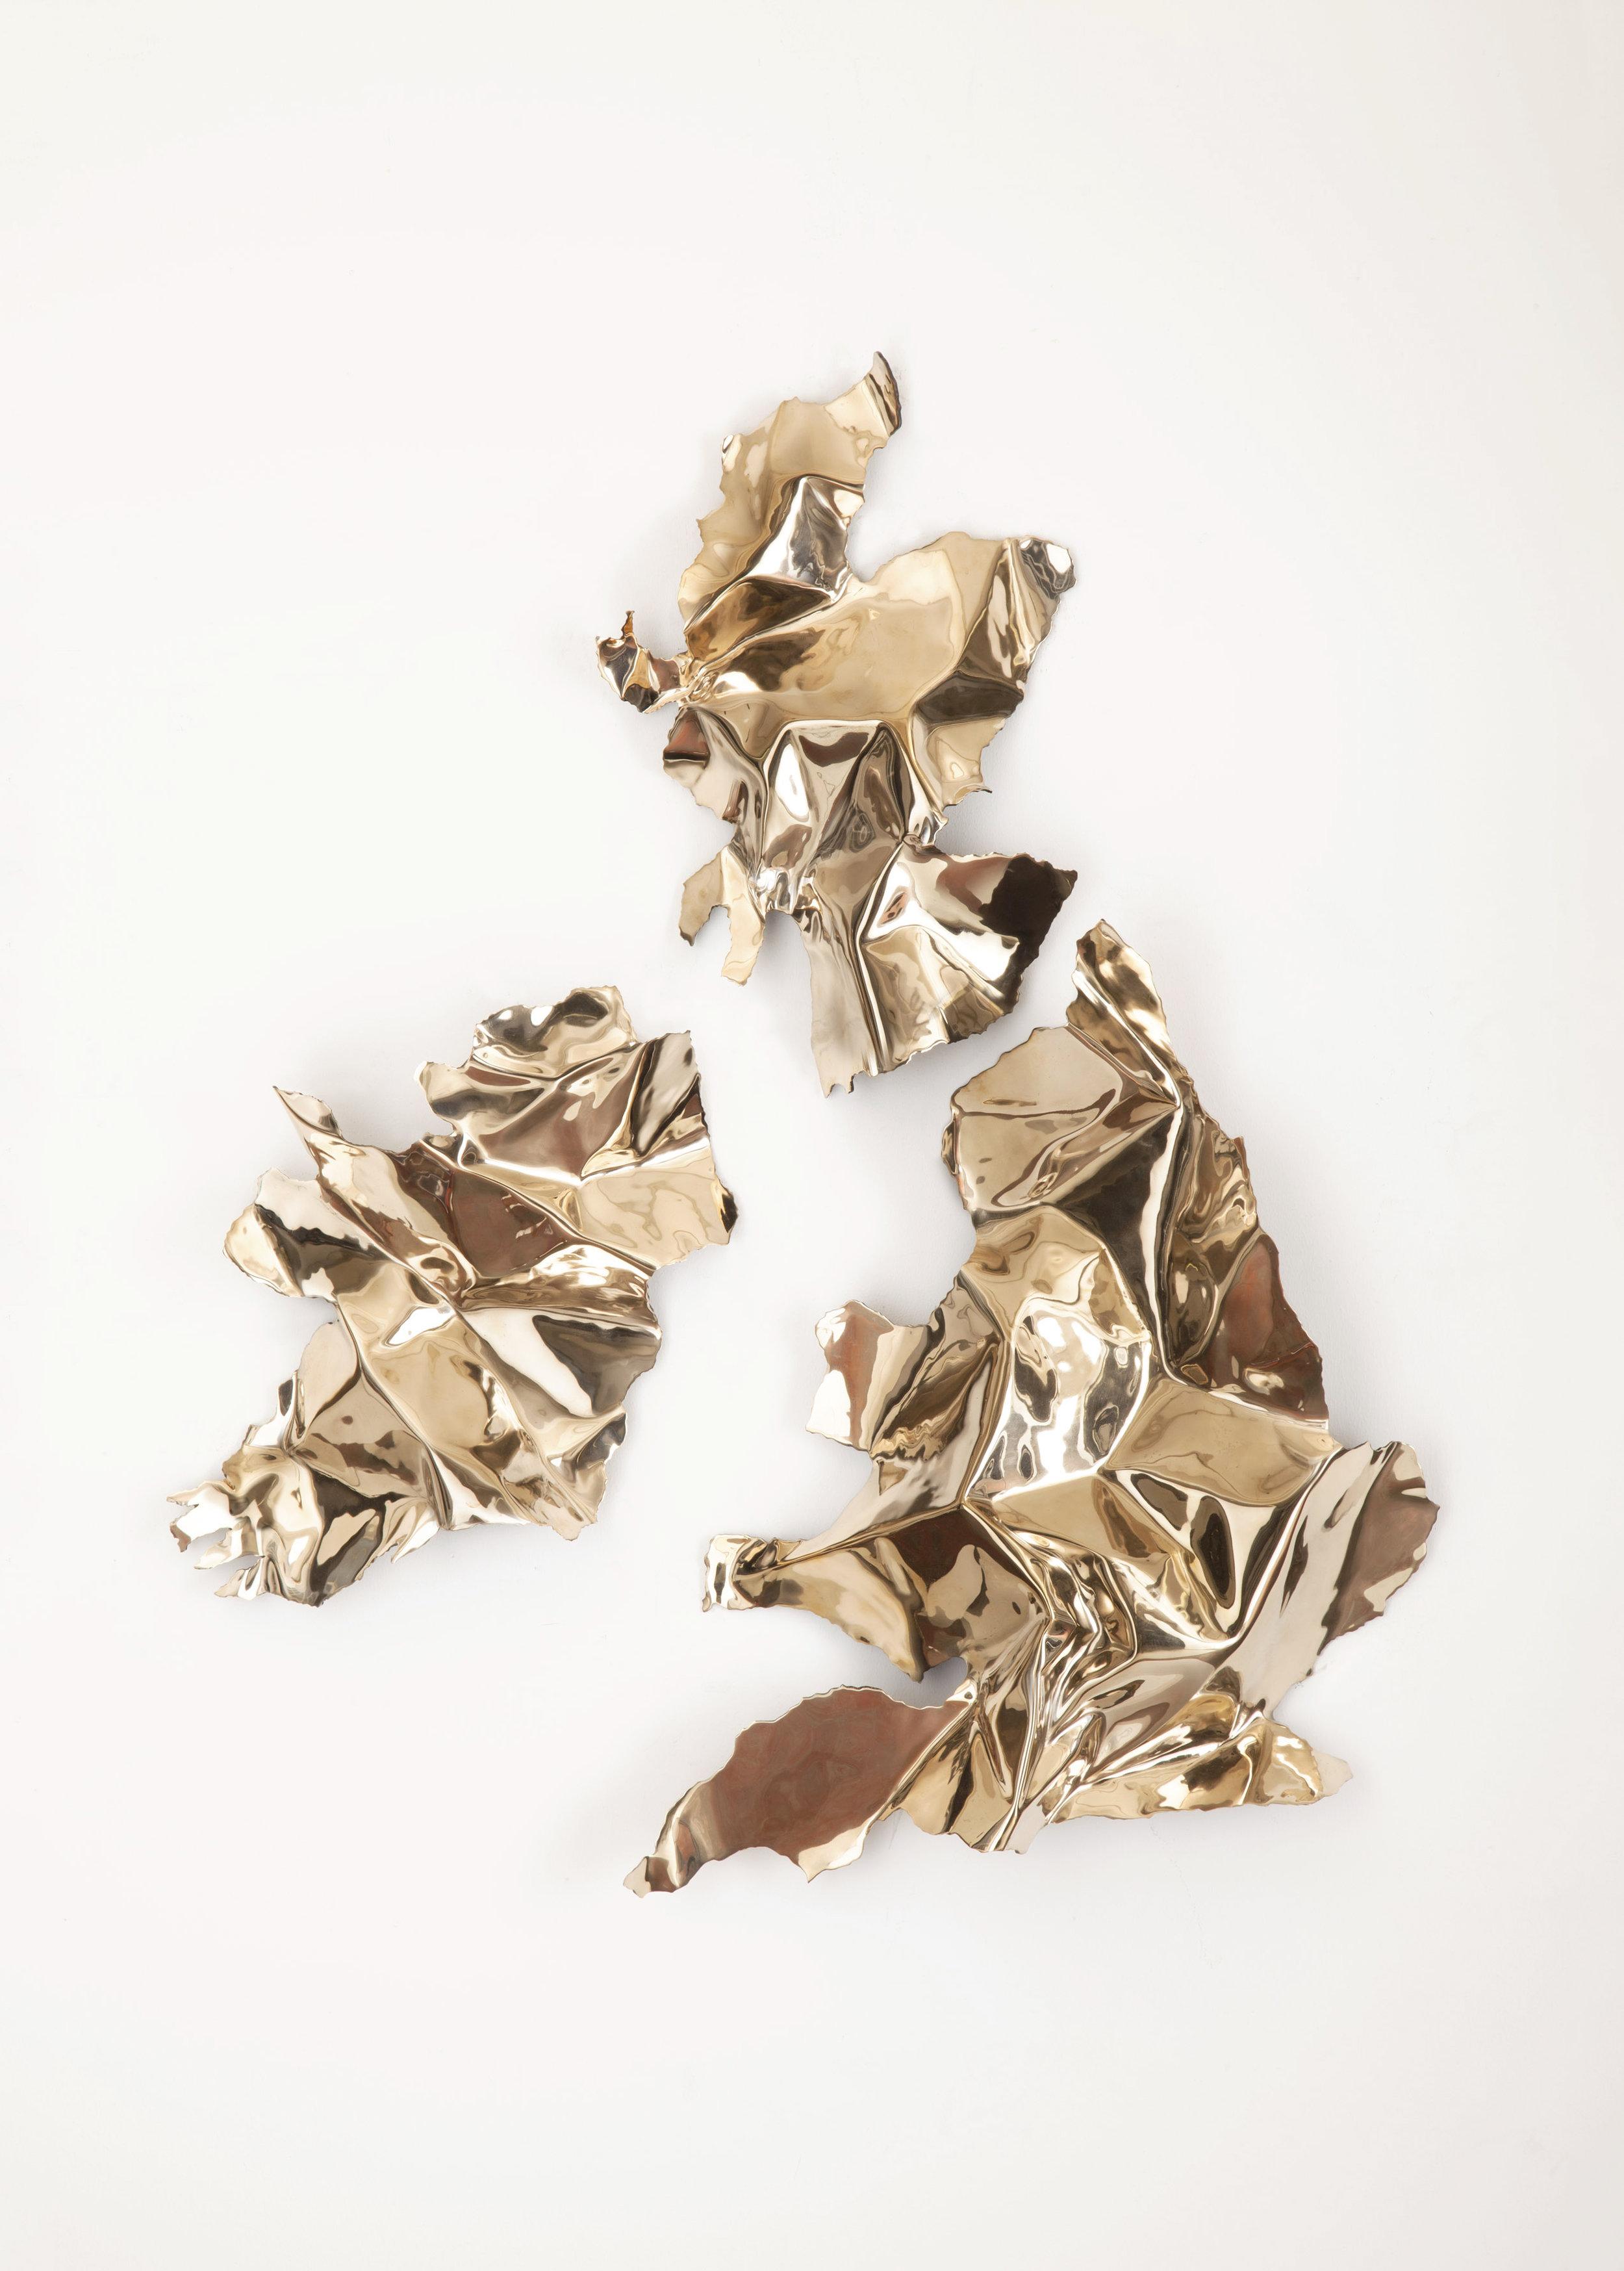 bu_00001_If I had known_UK_bronze_A.jpg